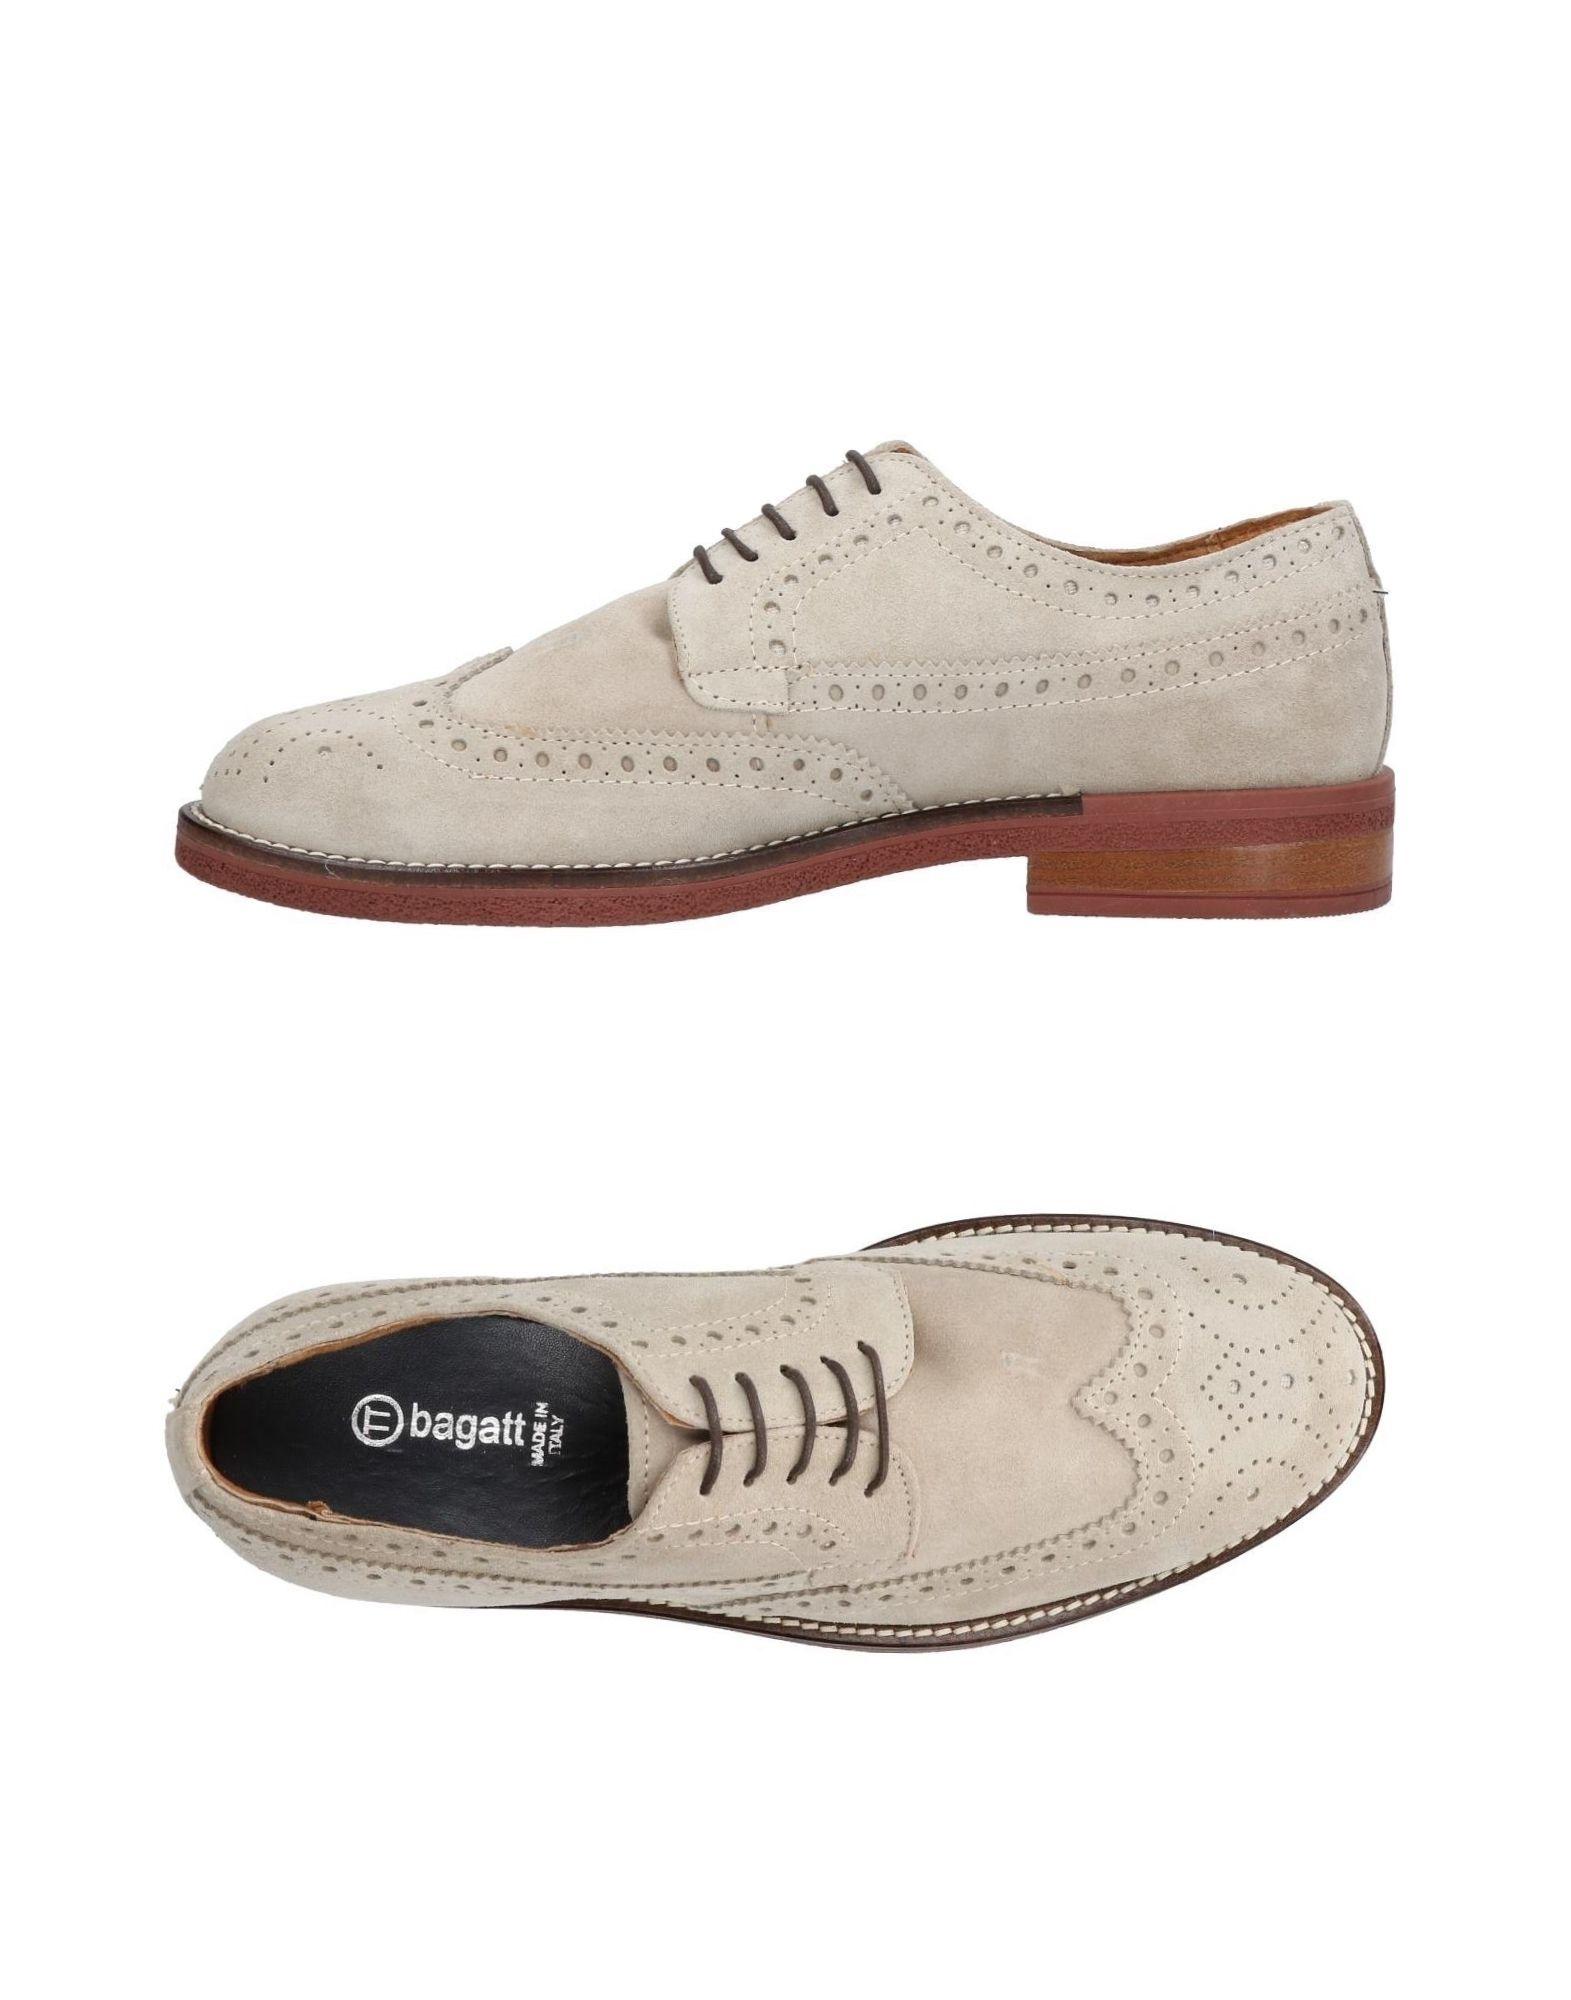 Bagatt Schnürschuhe Herren  11429065BN Heiße Schuhe